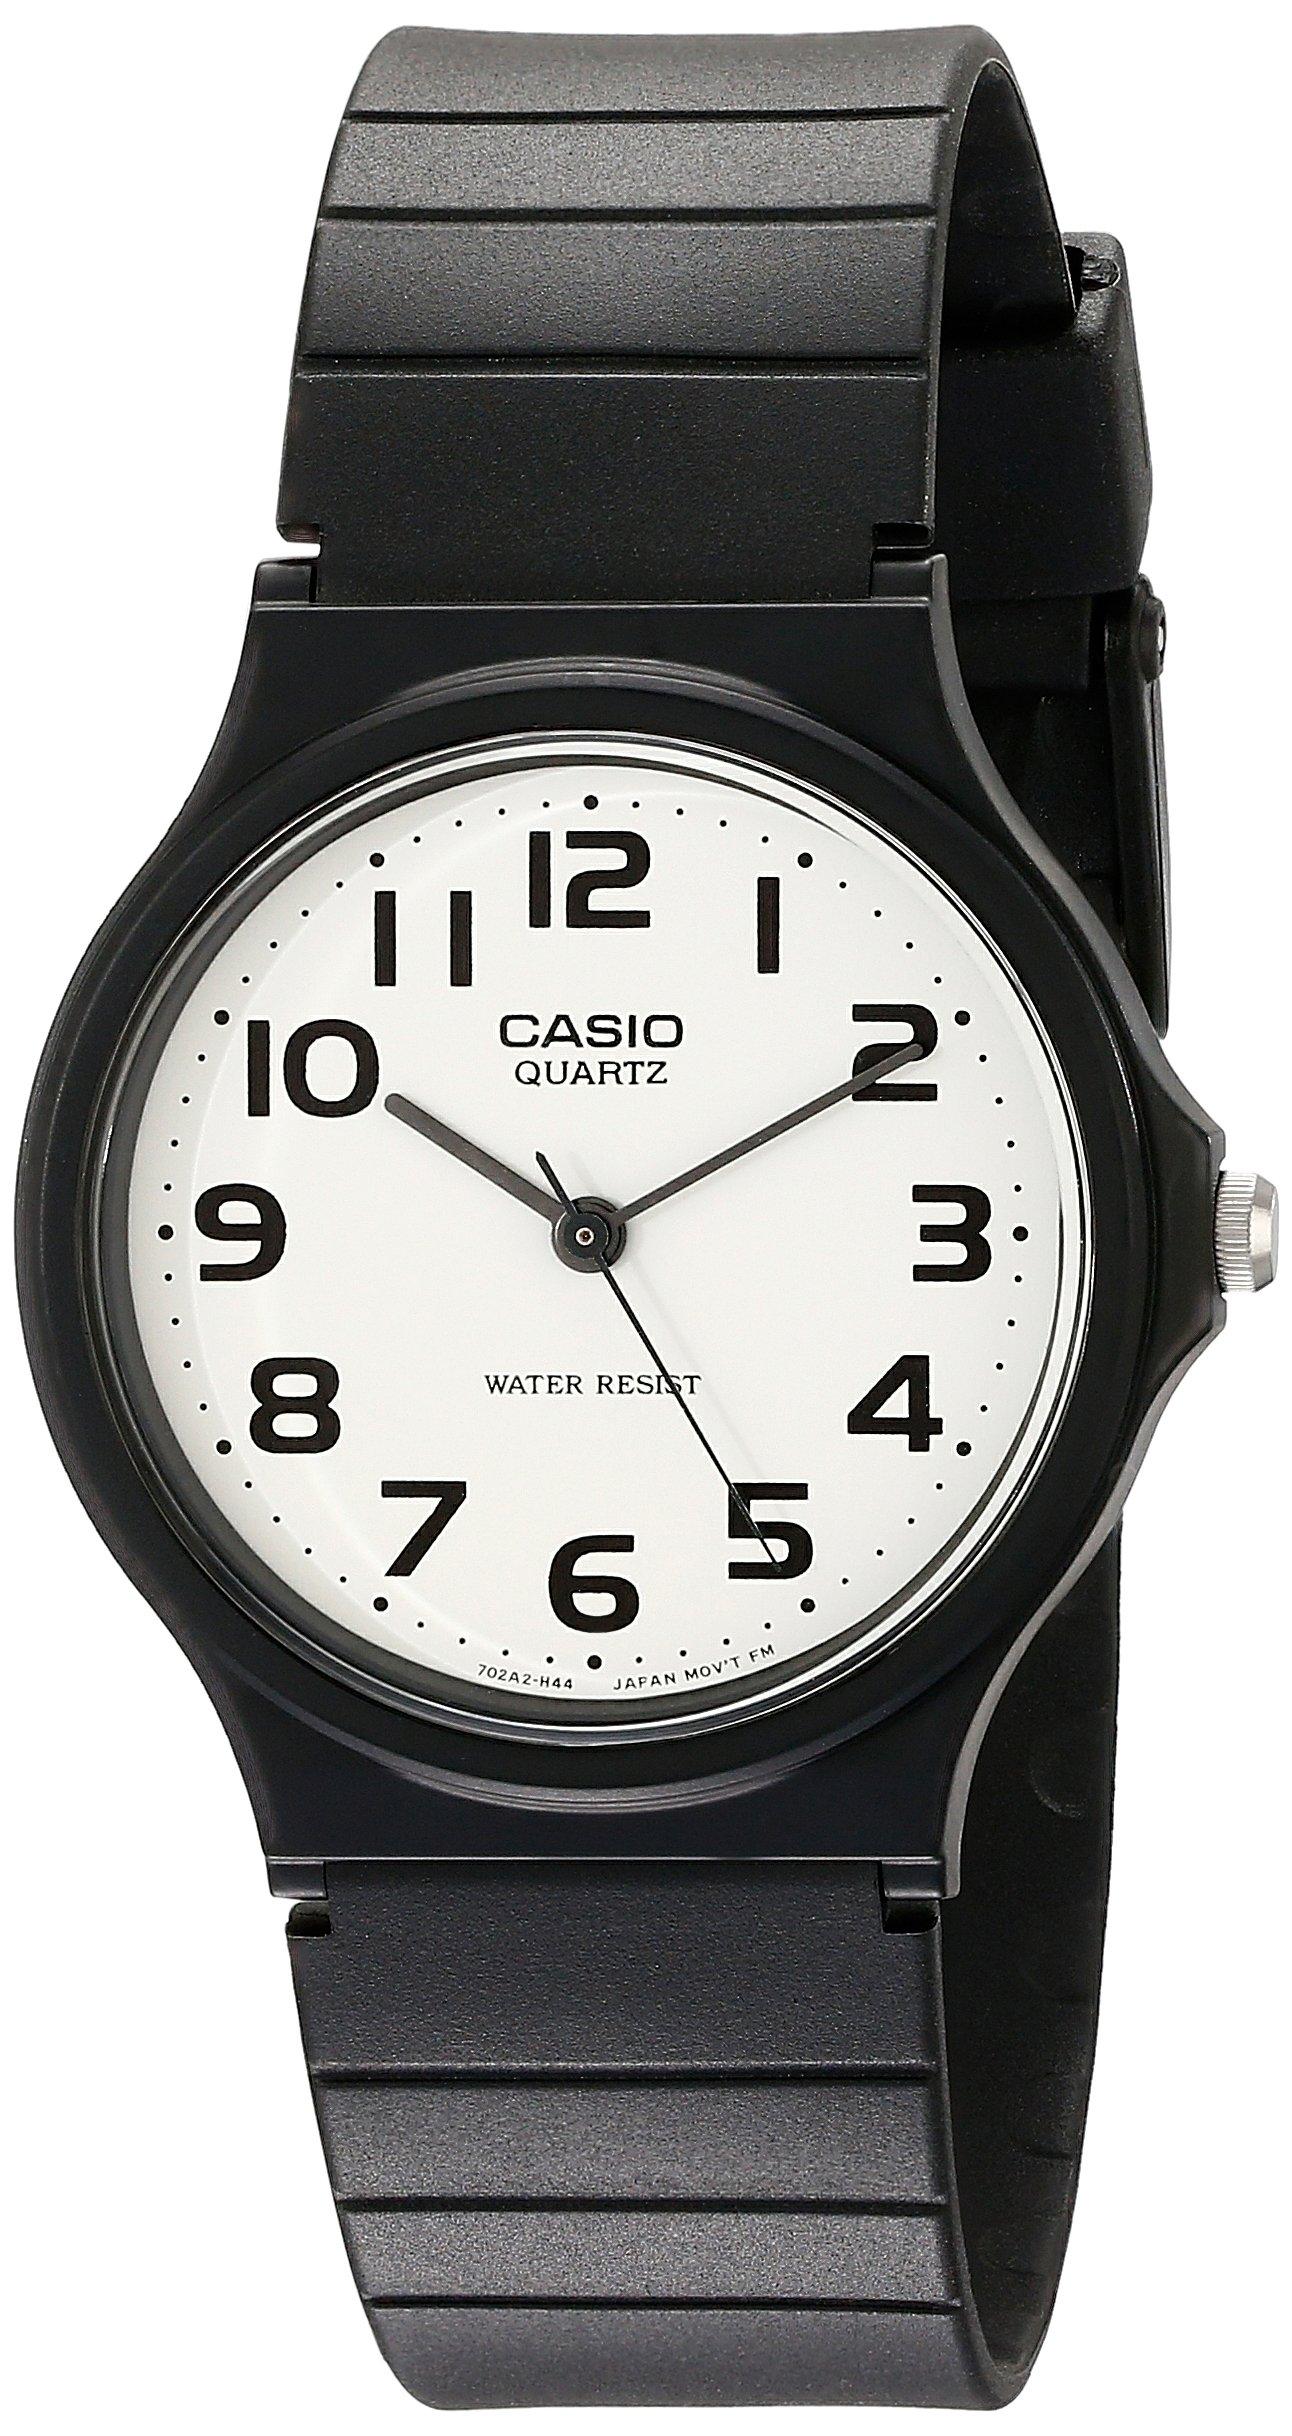 Casio Men's Classic Quartz Watch with Resin Strap, Black, 20 (Model: EAW-MQ-24-7B2) by Casio